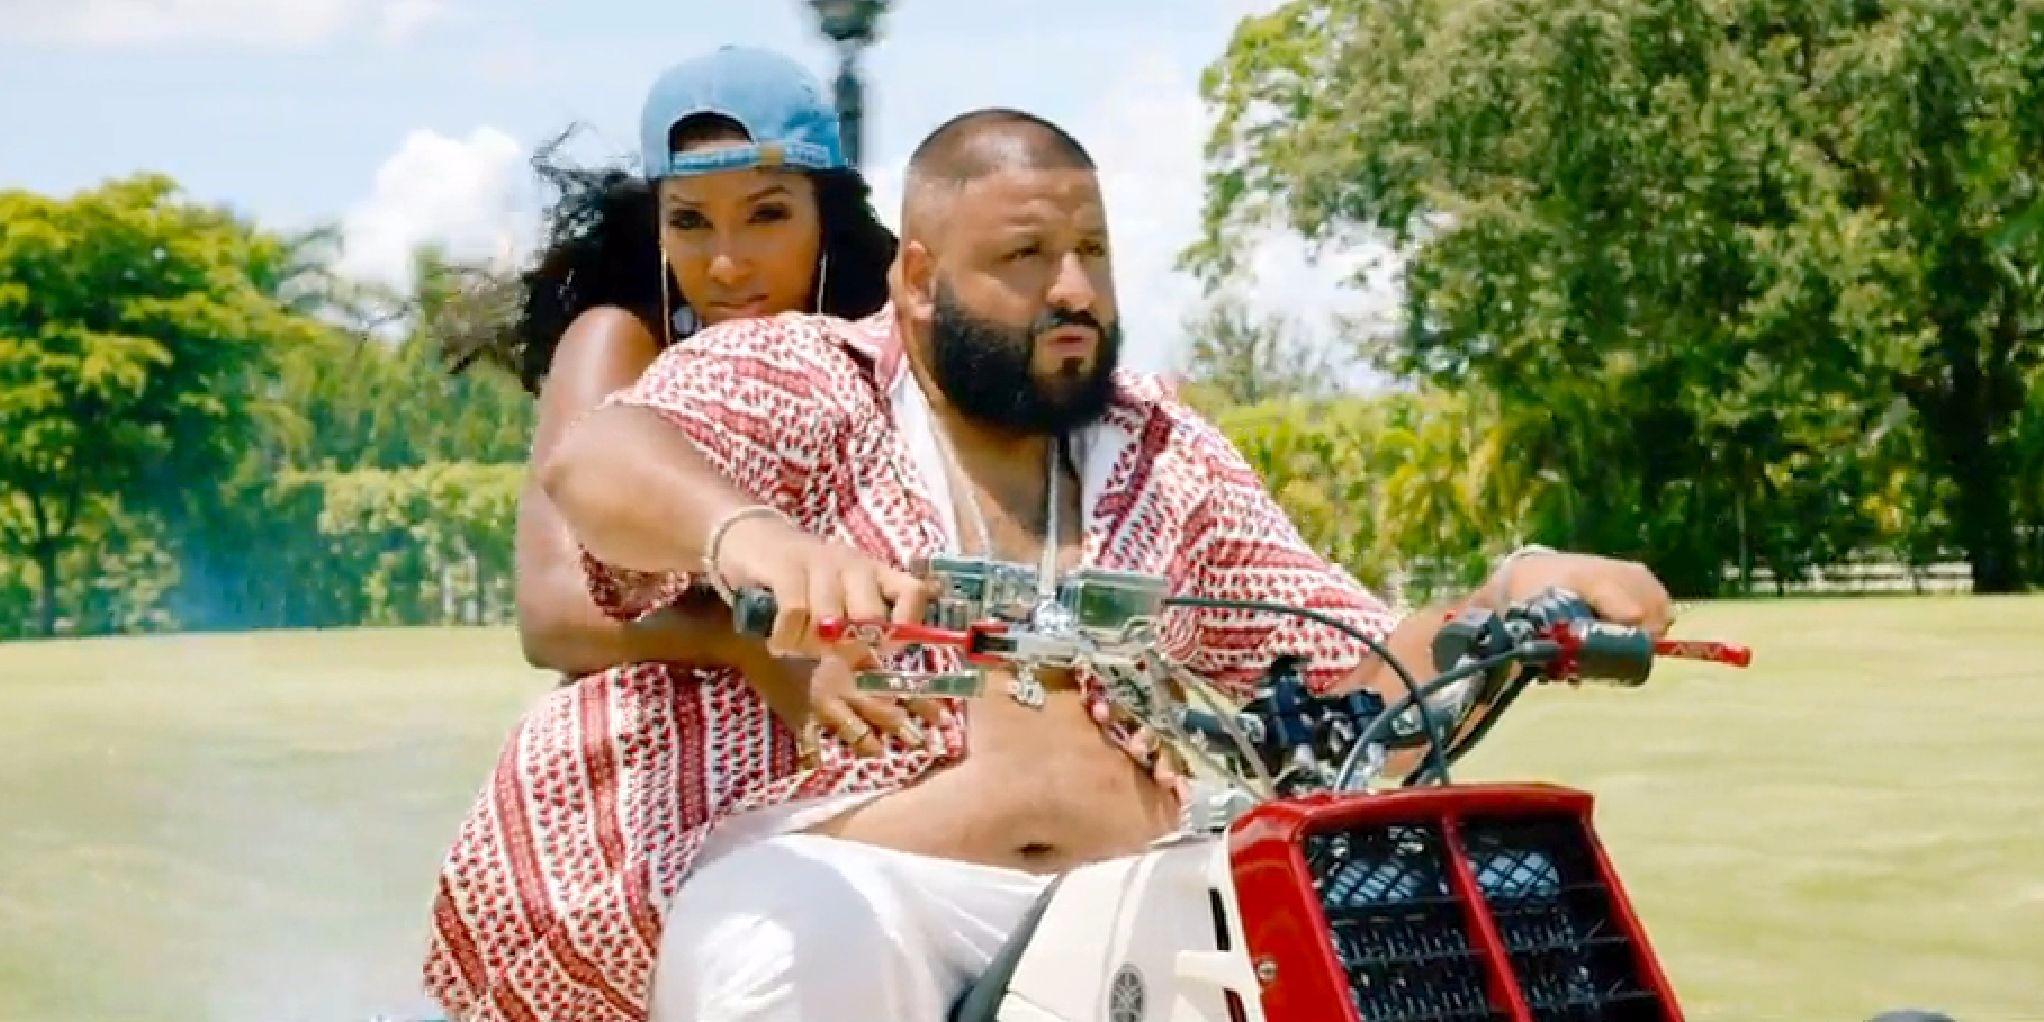 Bernice Burgos taking a ride with DJ Khaled on a bike